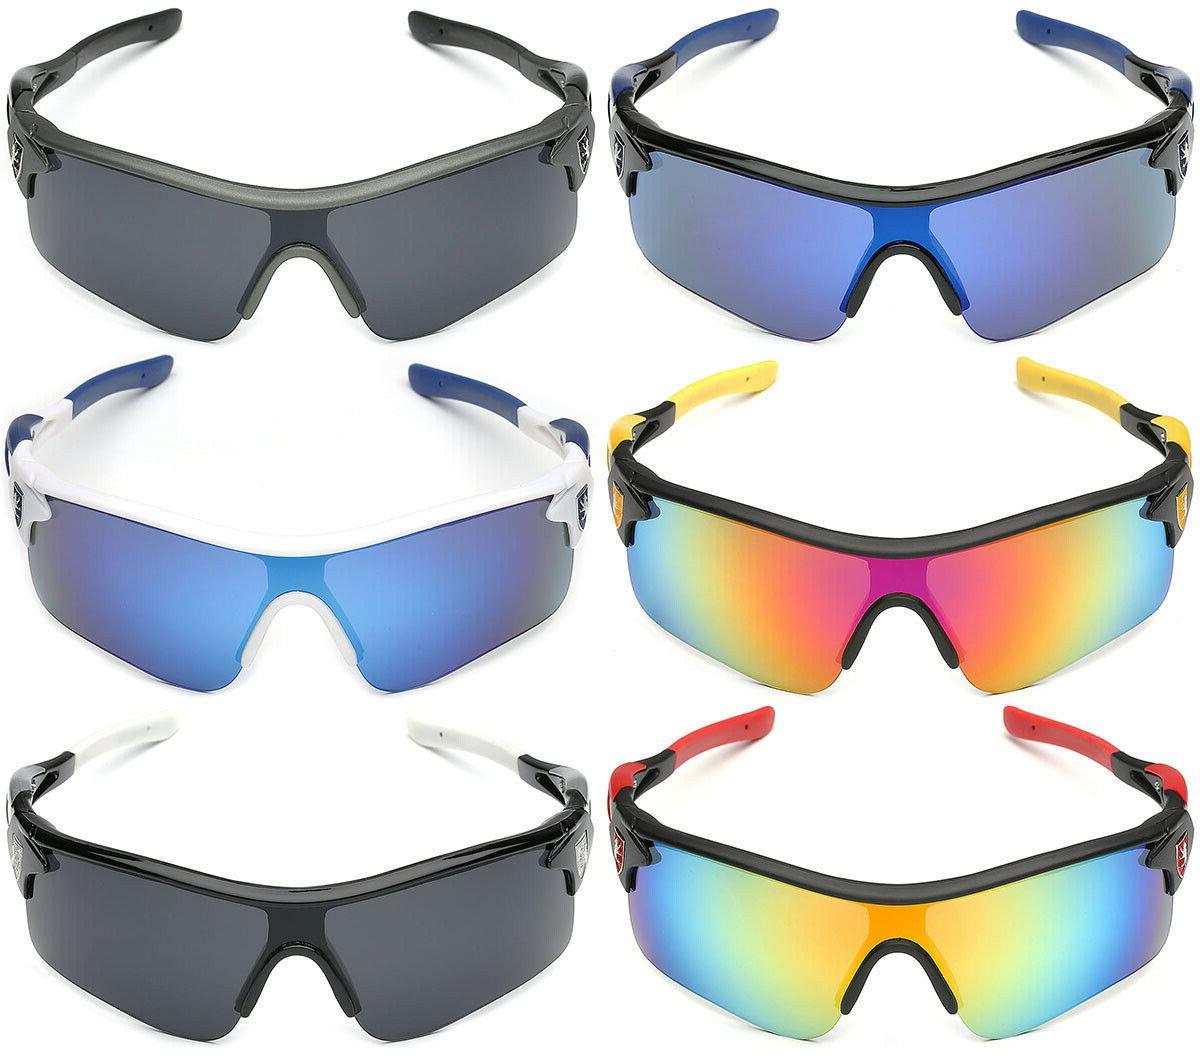 Sport Men Cycling Golf Ski Sunglasses Color Mirror Lens Glasses